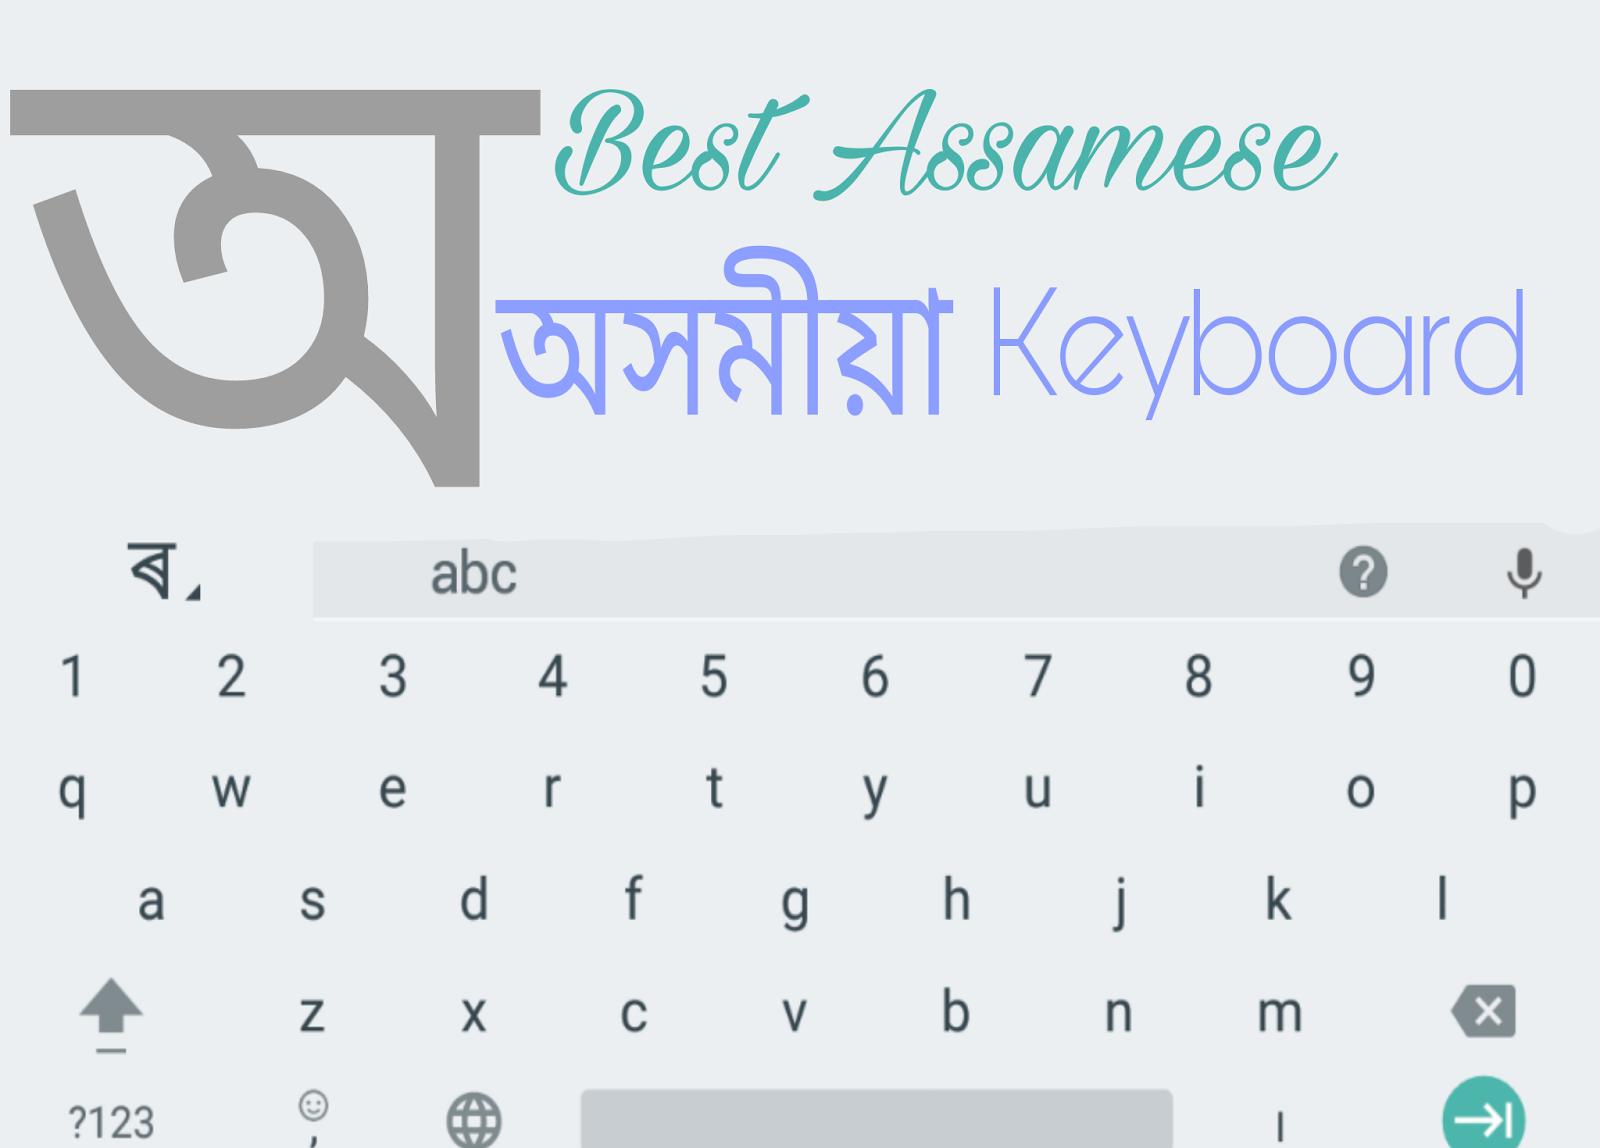 Best assamese keyboard